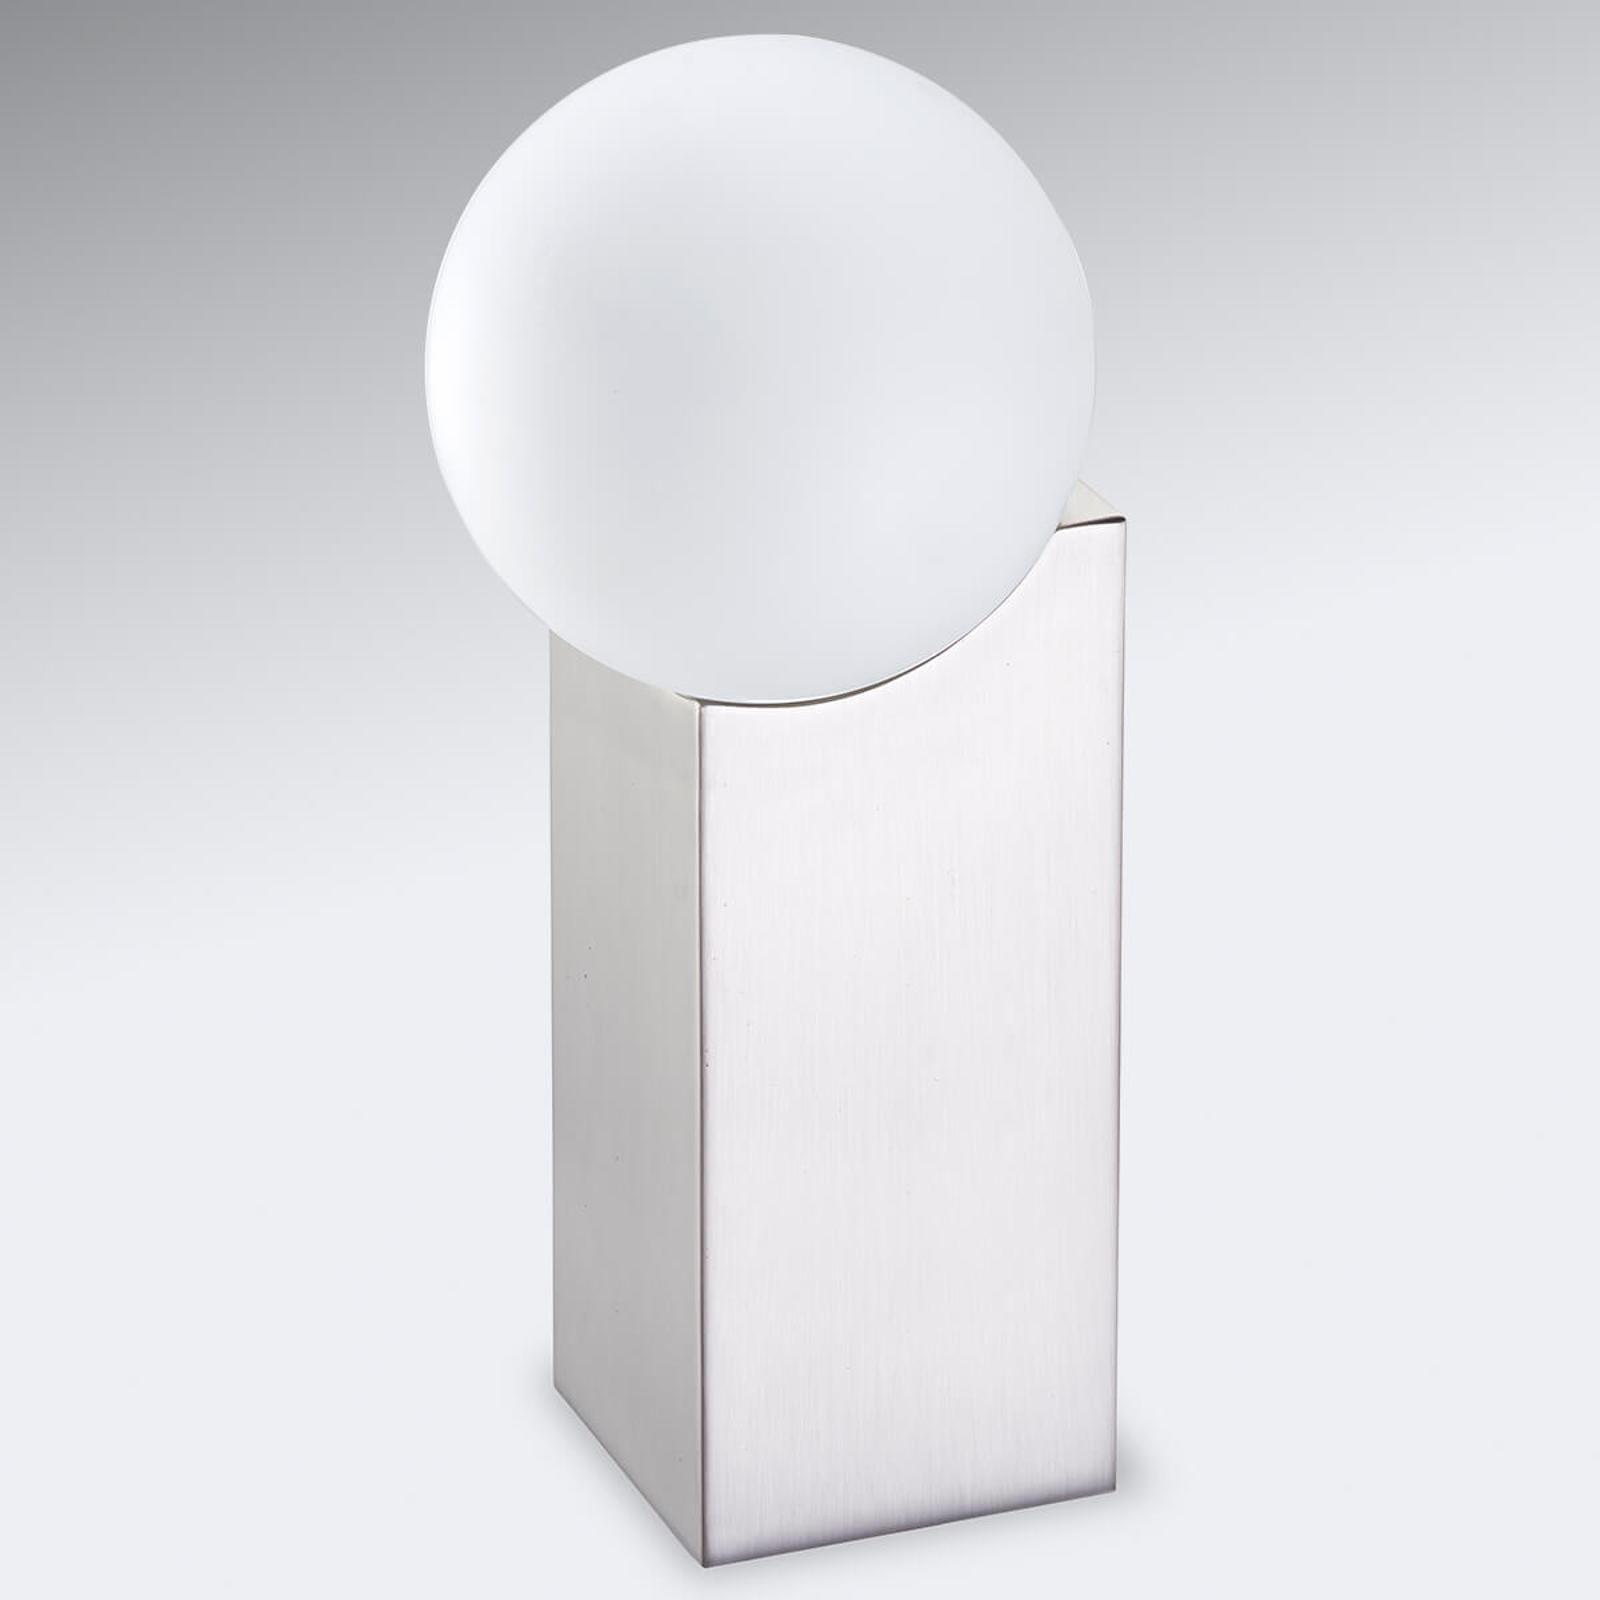 Lampe à poser Cub 23,5cm nickel mat